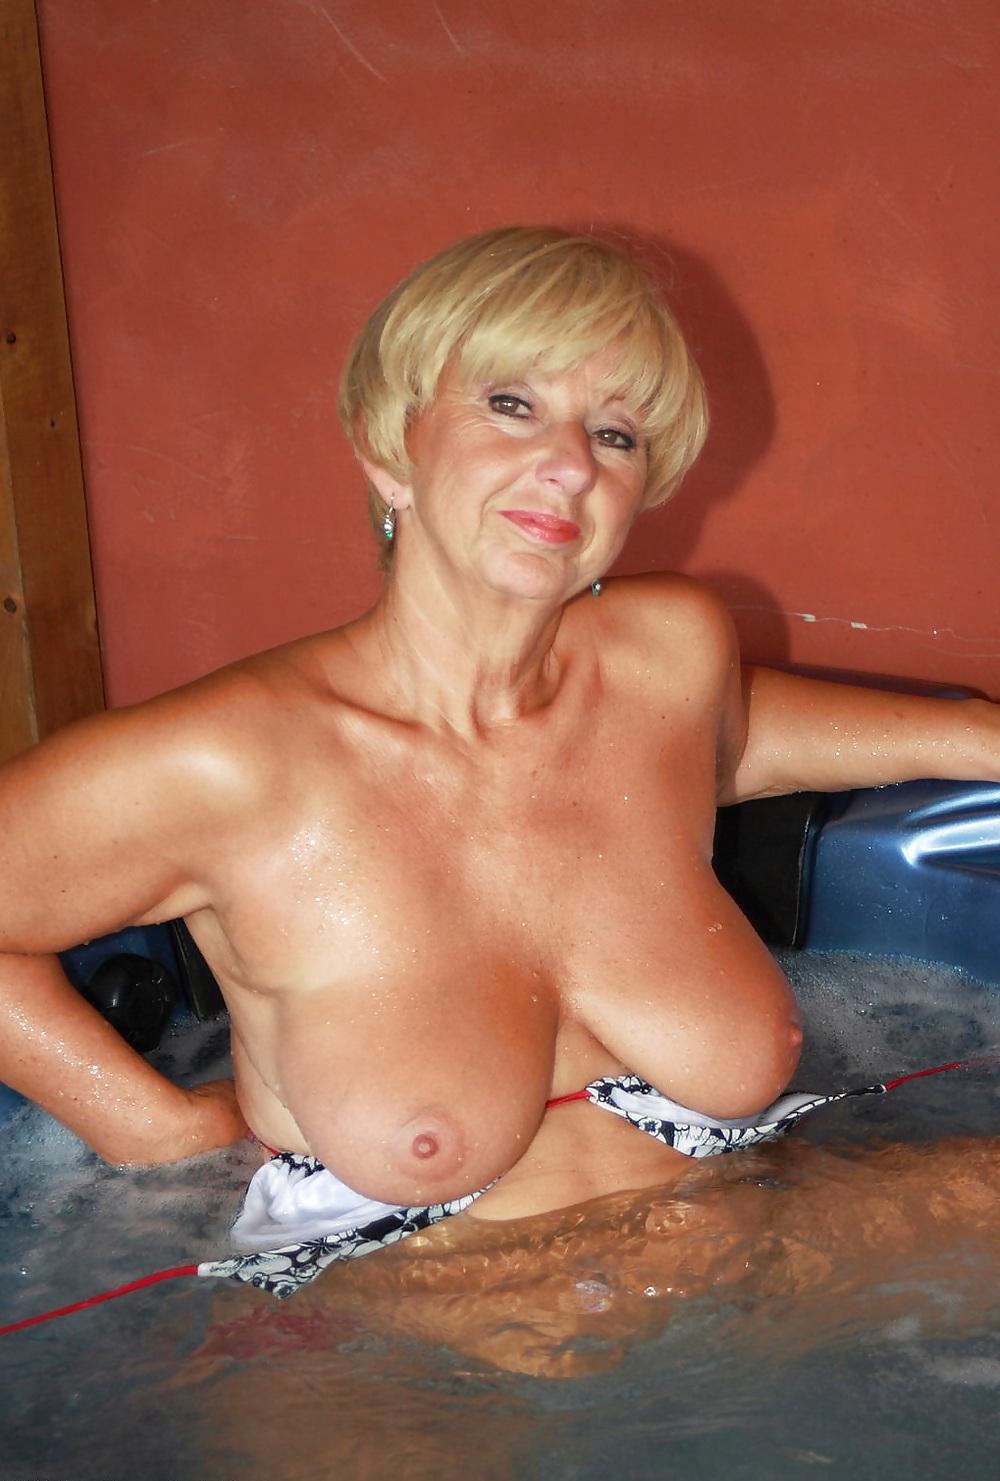 Bikini Naked Gf Com Scenes